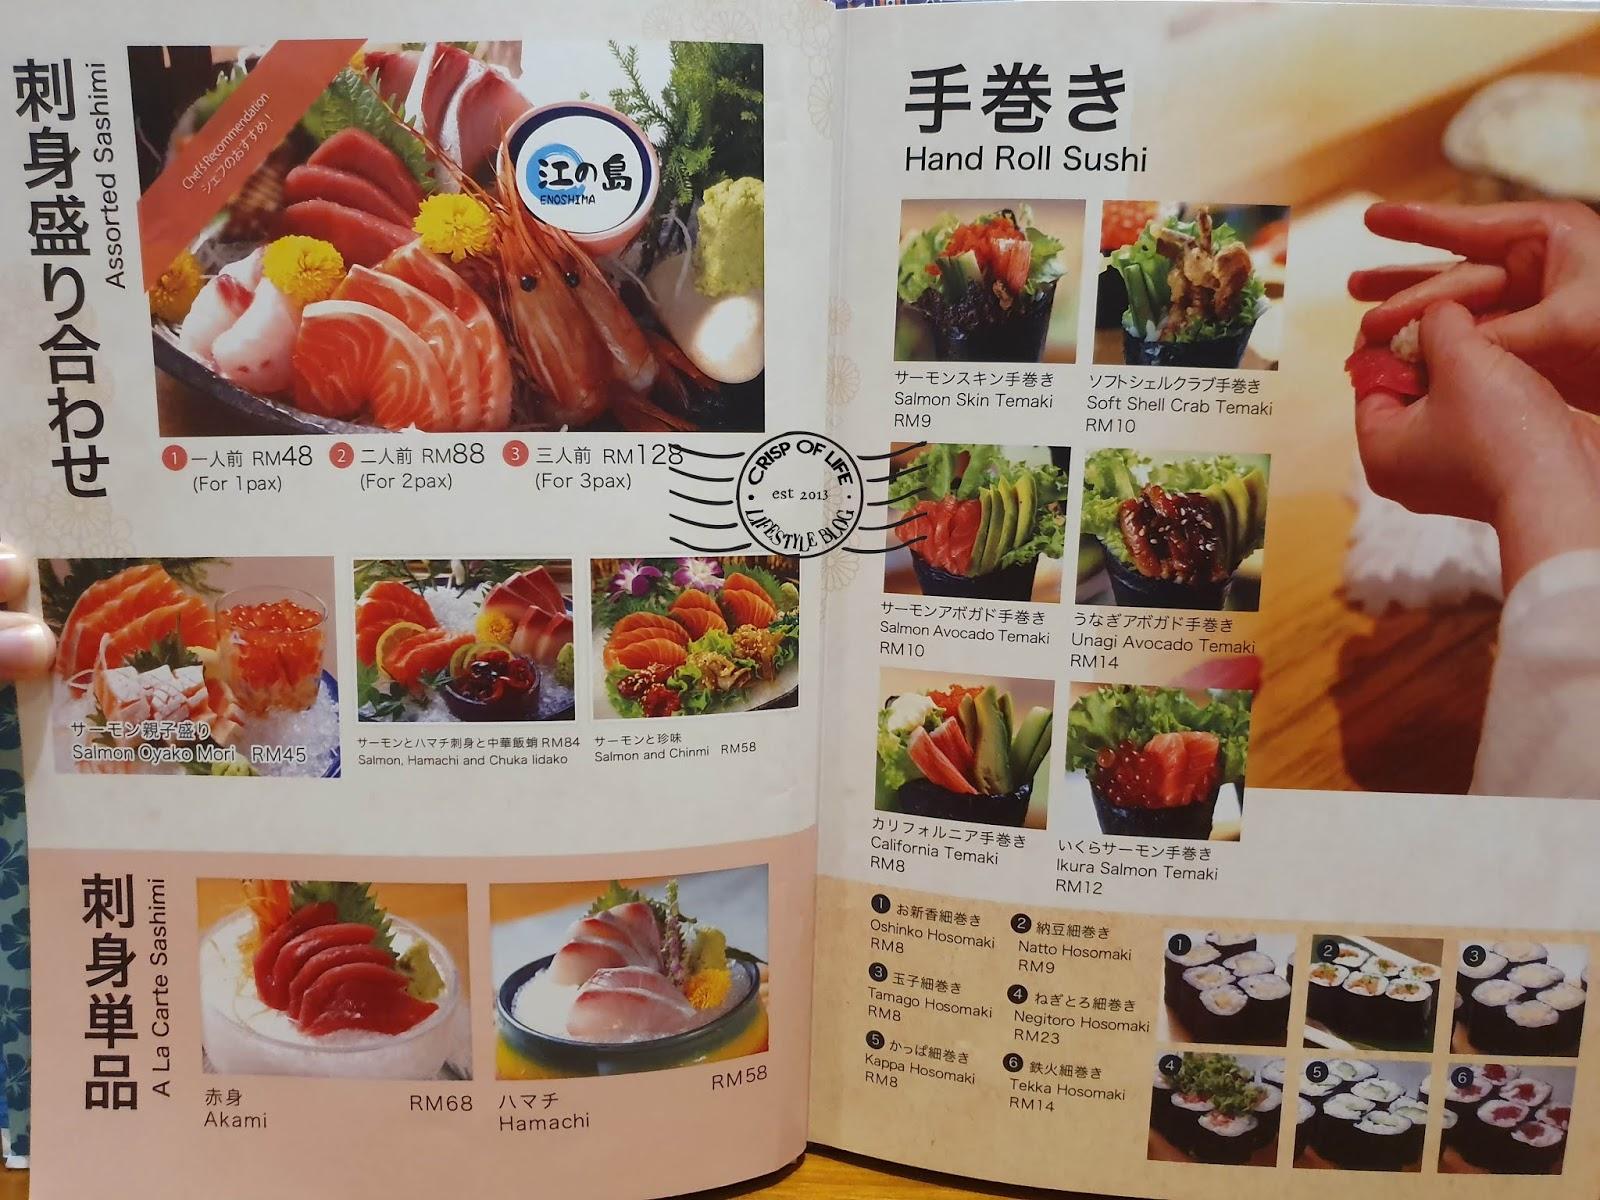 Enoshima Japanese Restaurant @ Cititel Express, Penang